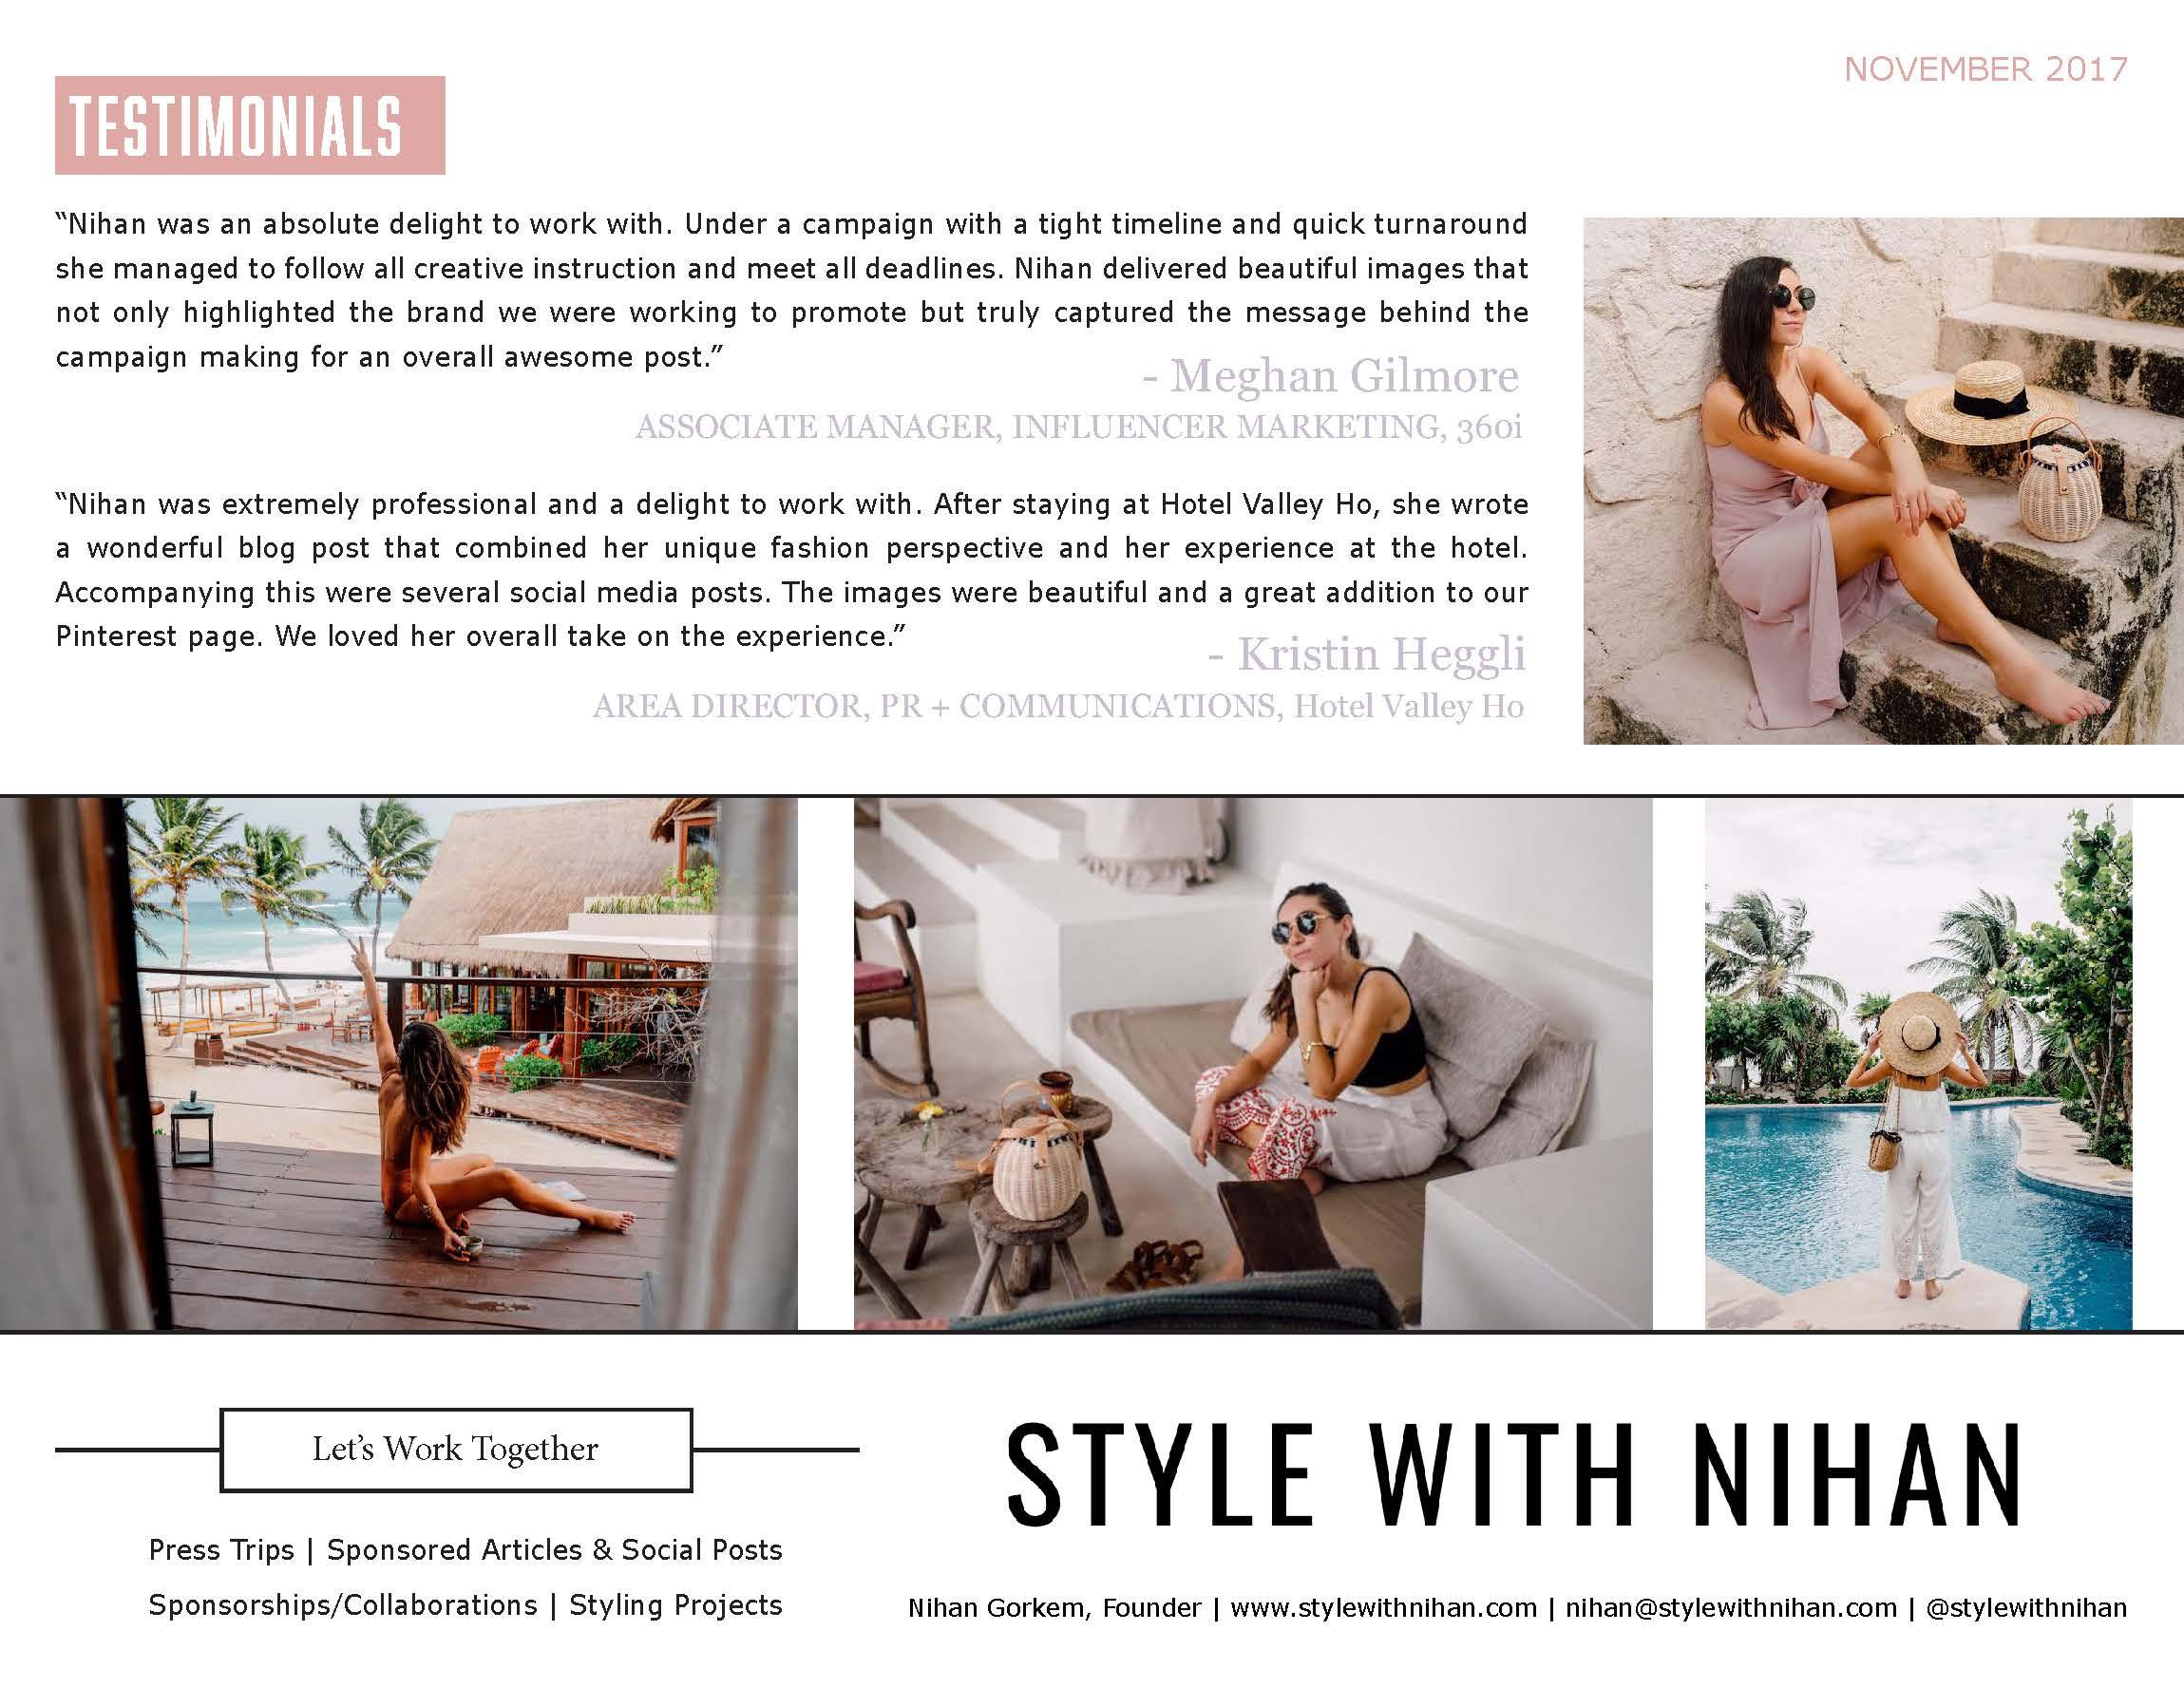 StyleWithNihan-MediaKit-11-17_Page_3.jpg